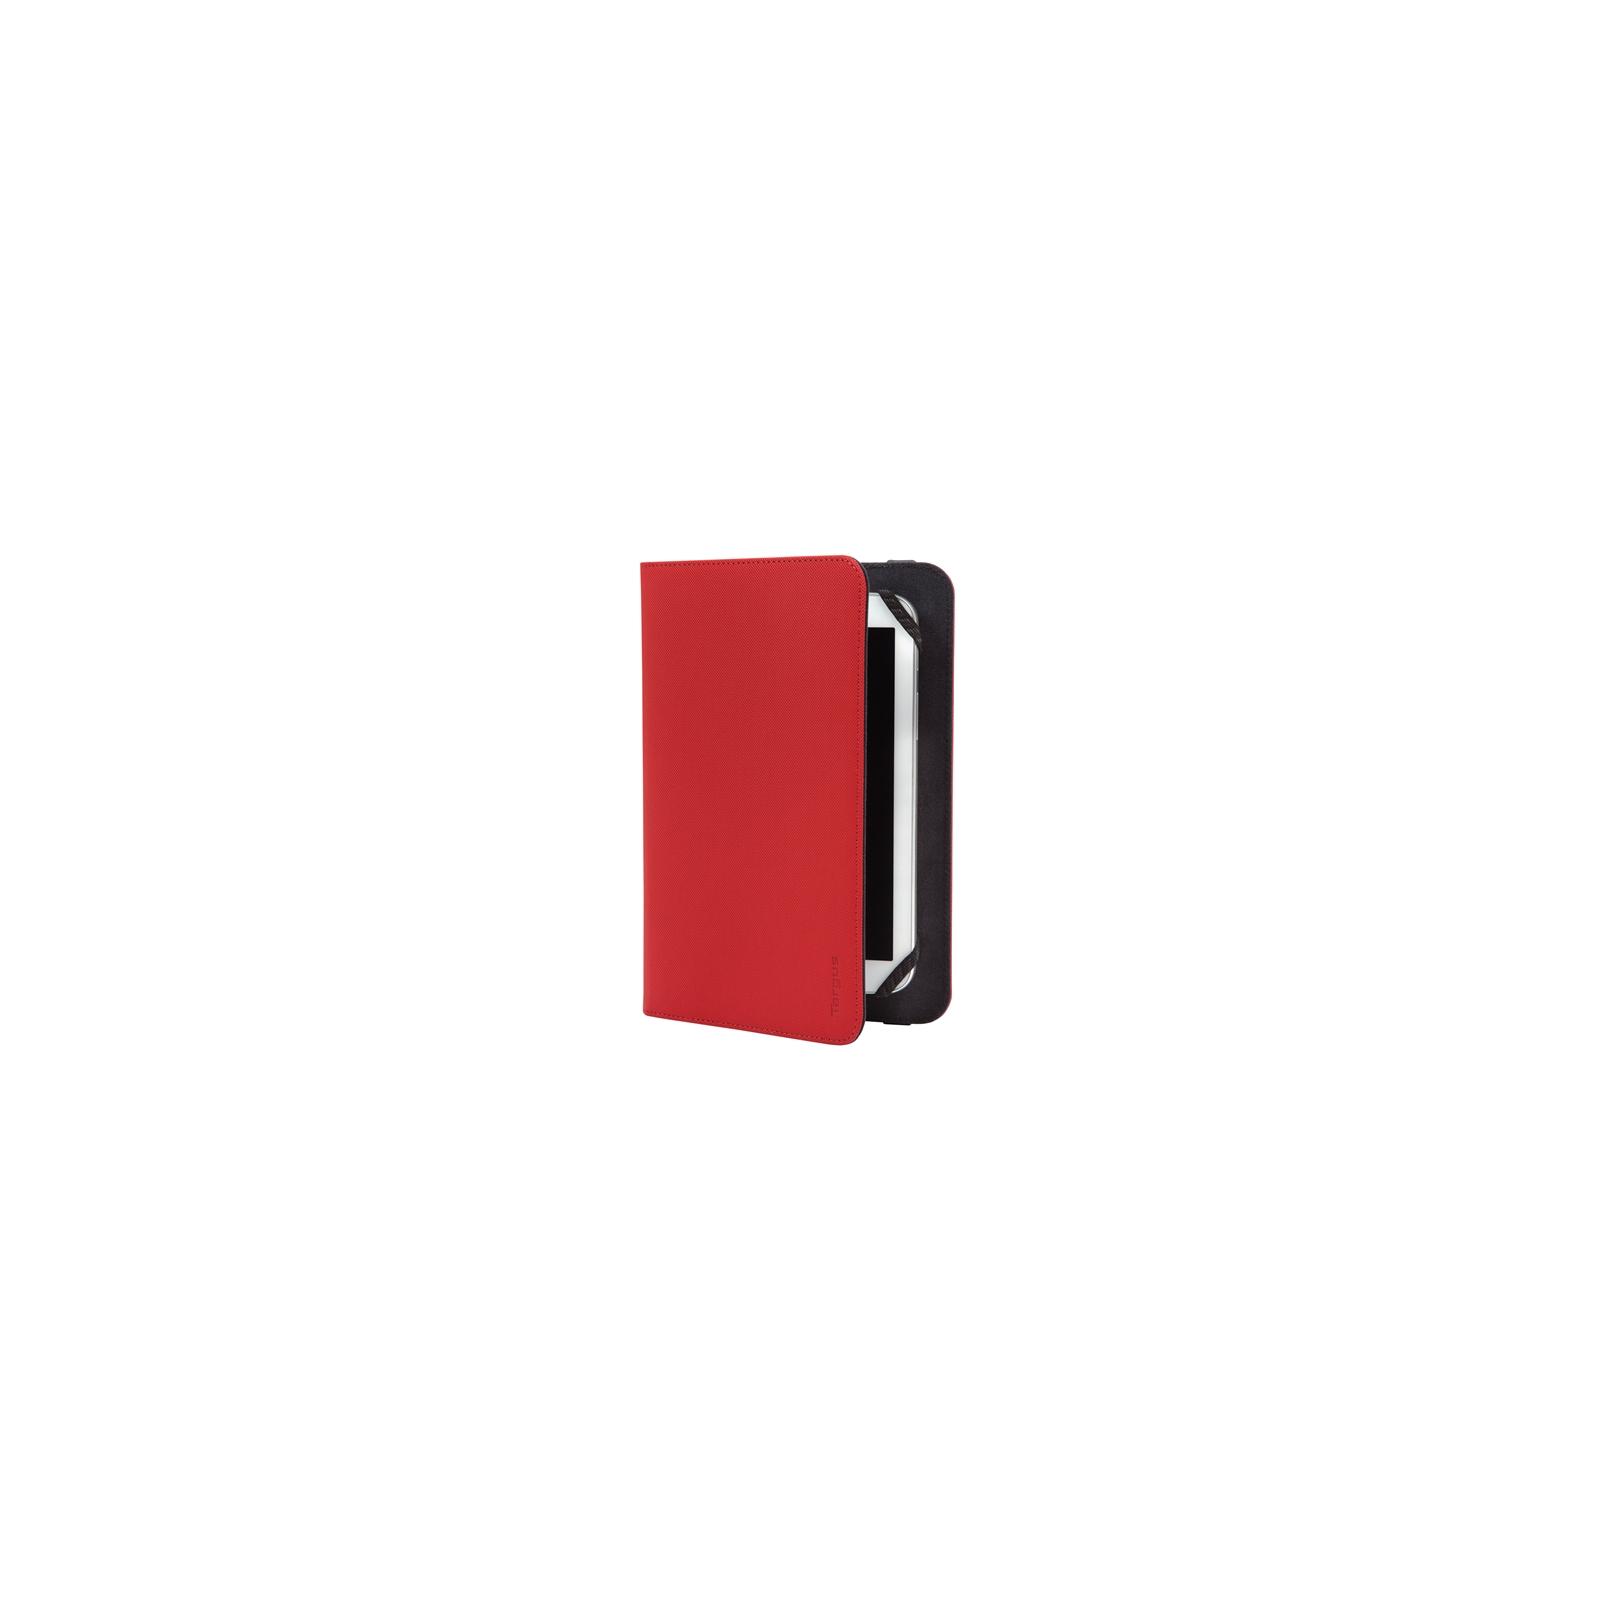 "Чехол для планшета Targus 7-8"" Universal RED stand (THZ33301EU) изображение 2"